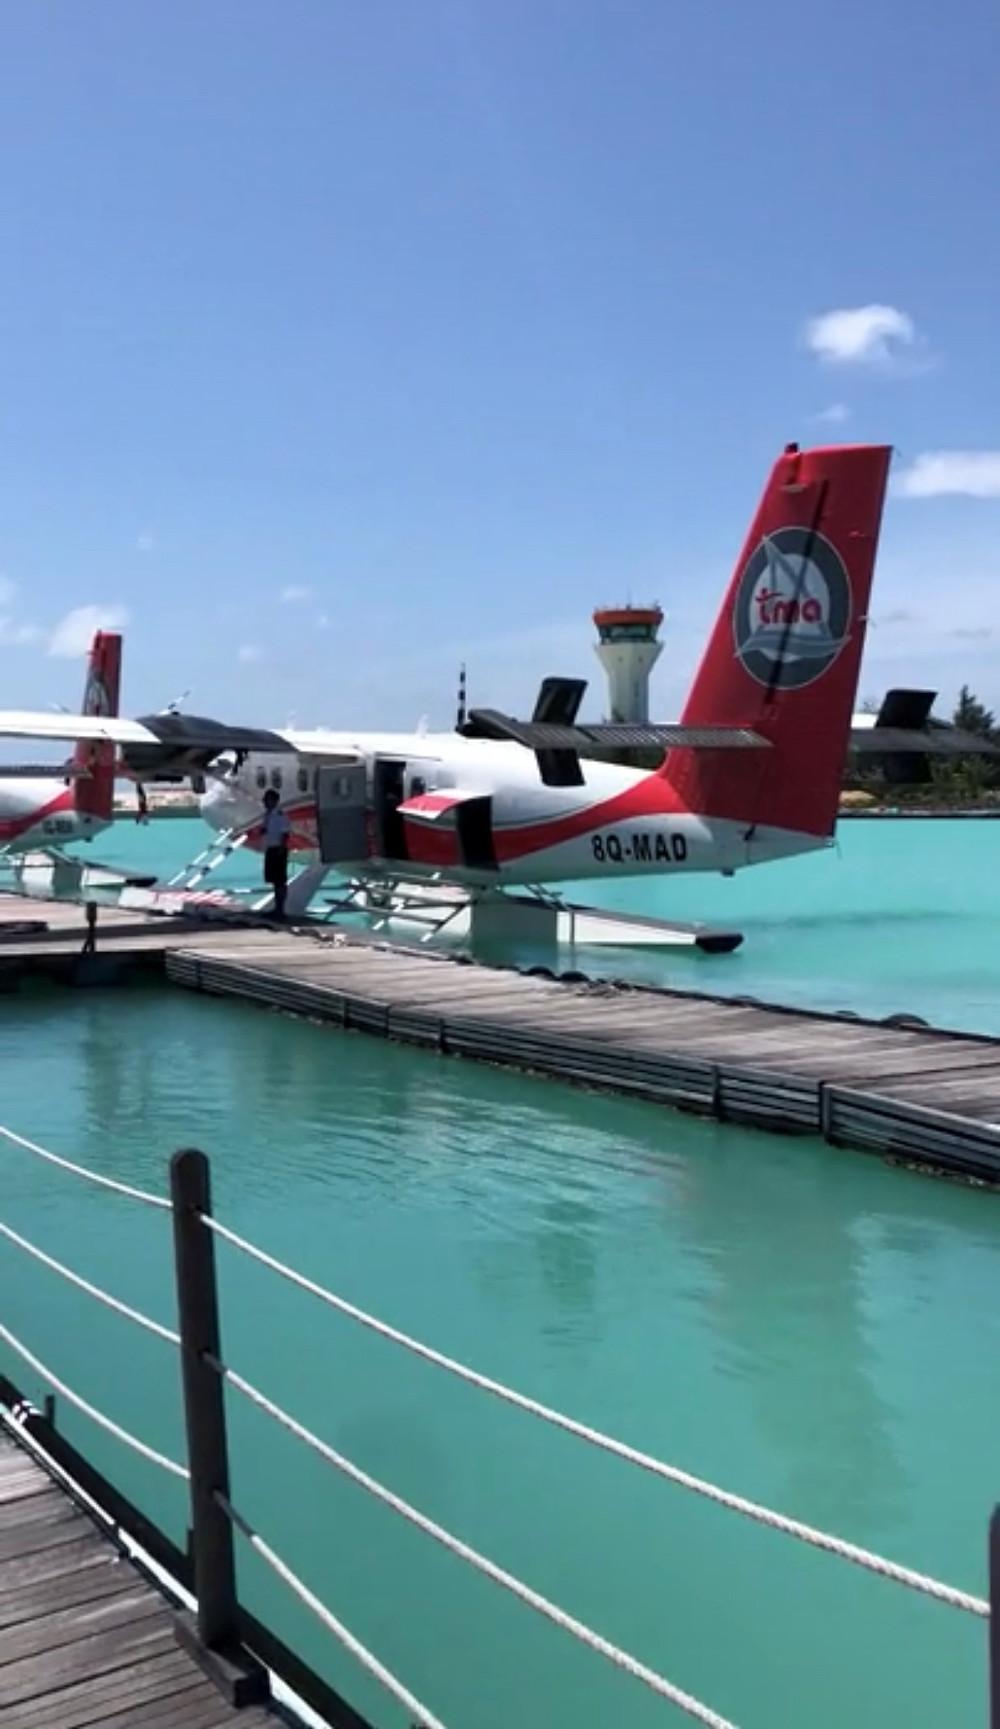 Seaplane Ready for Take-off